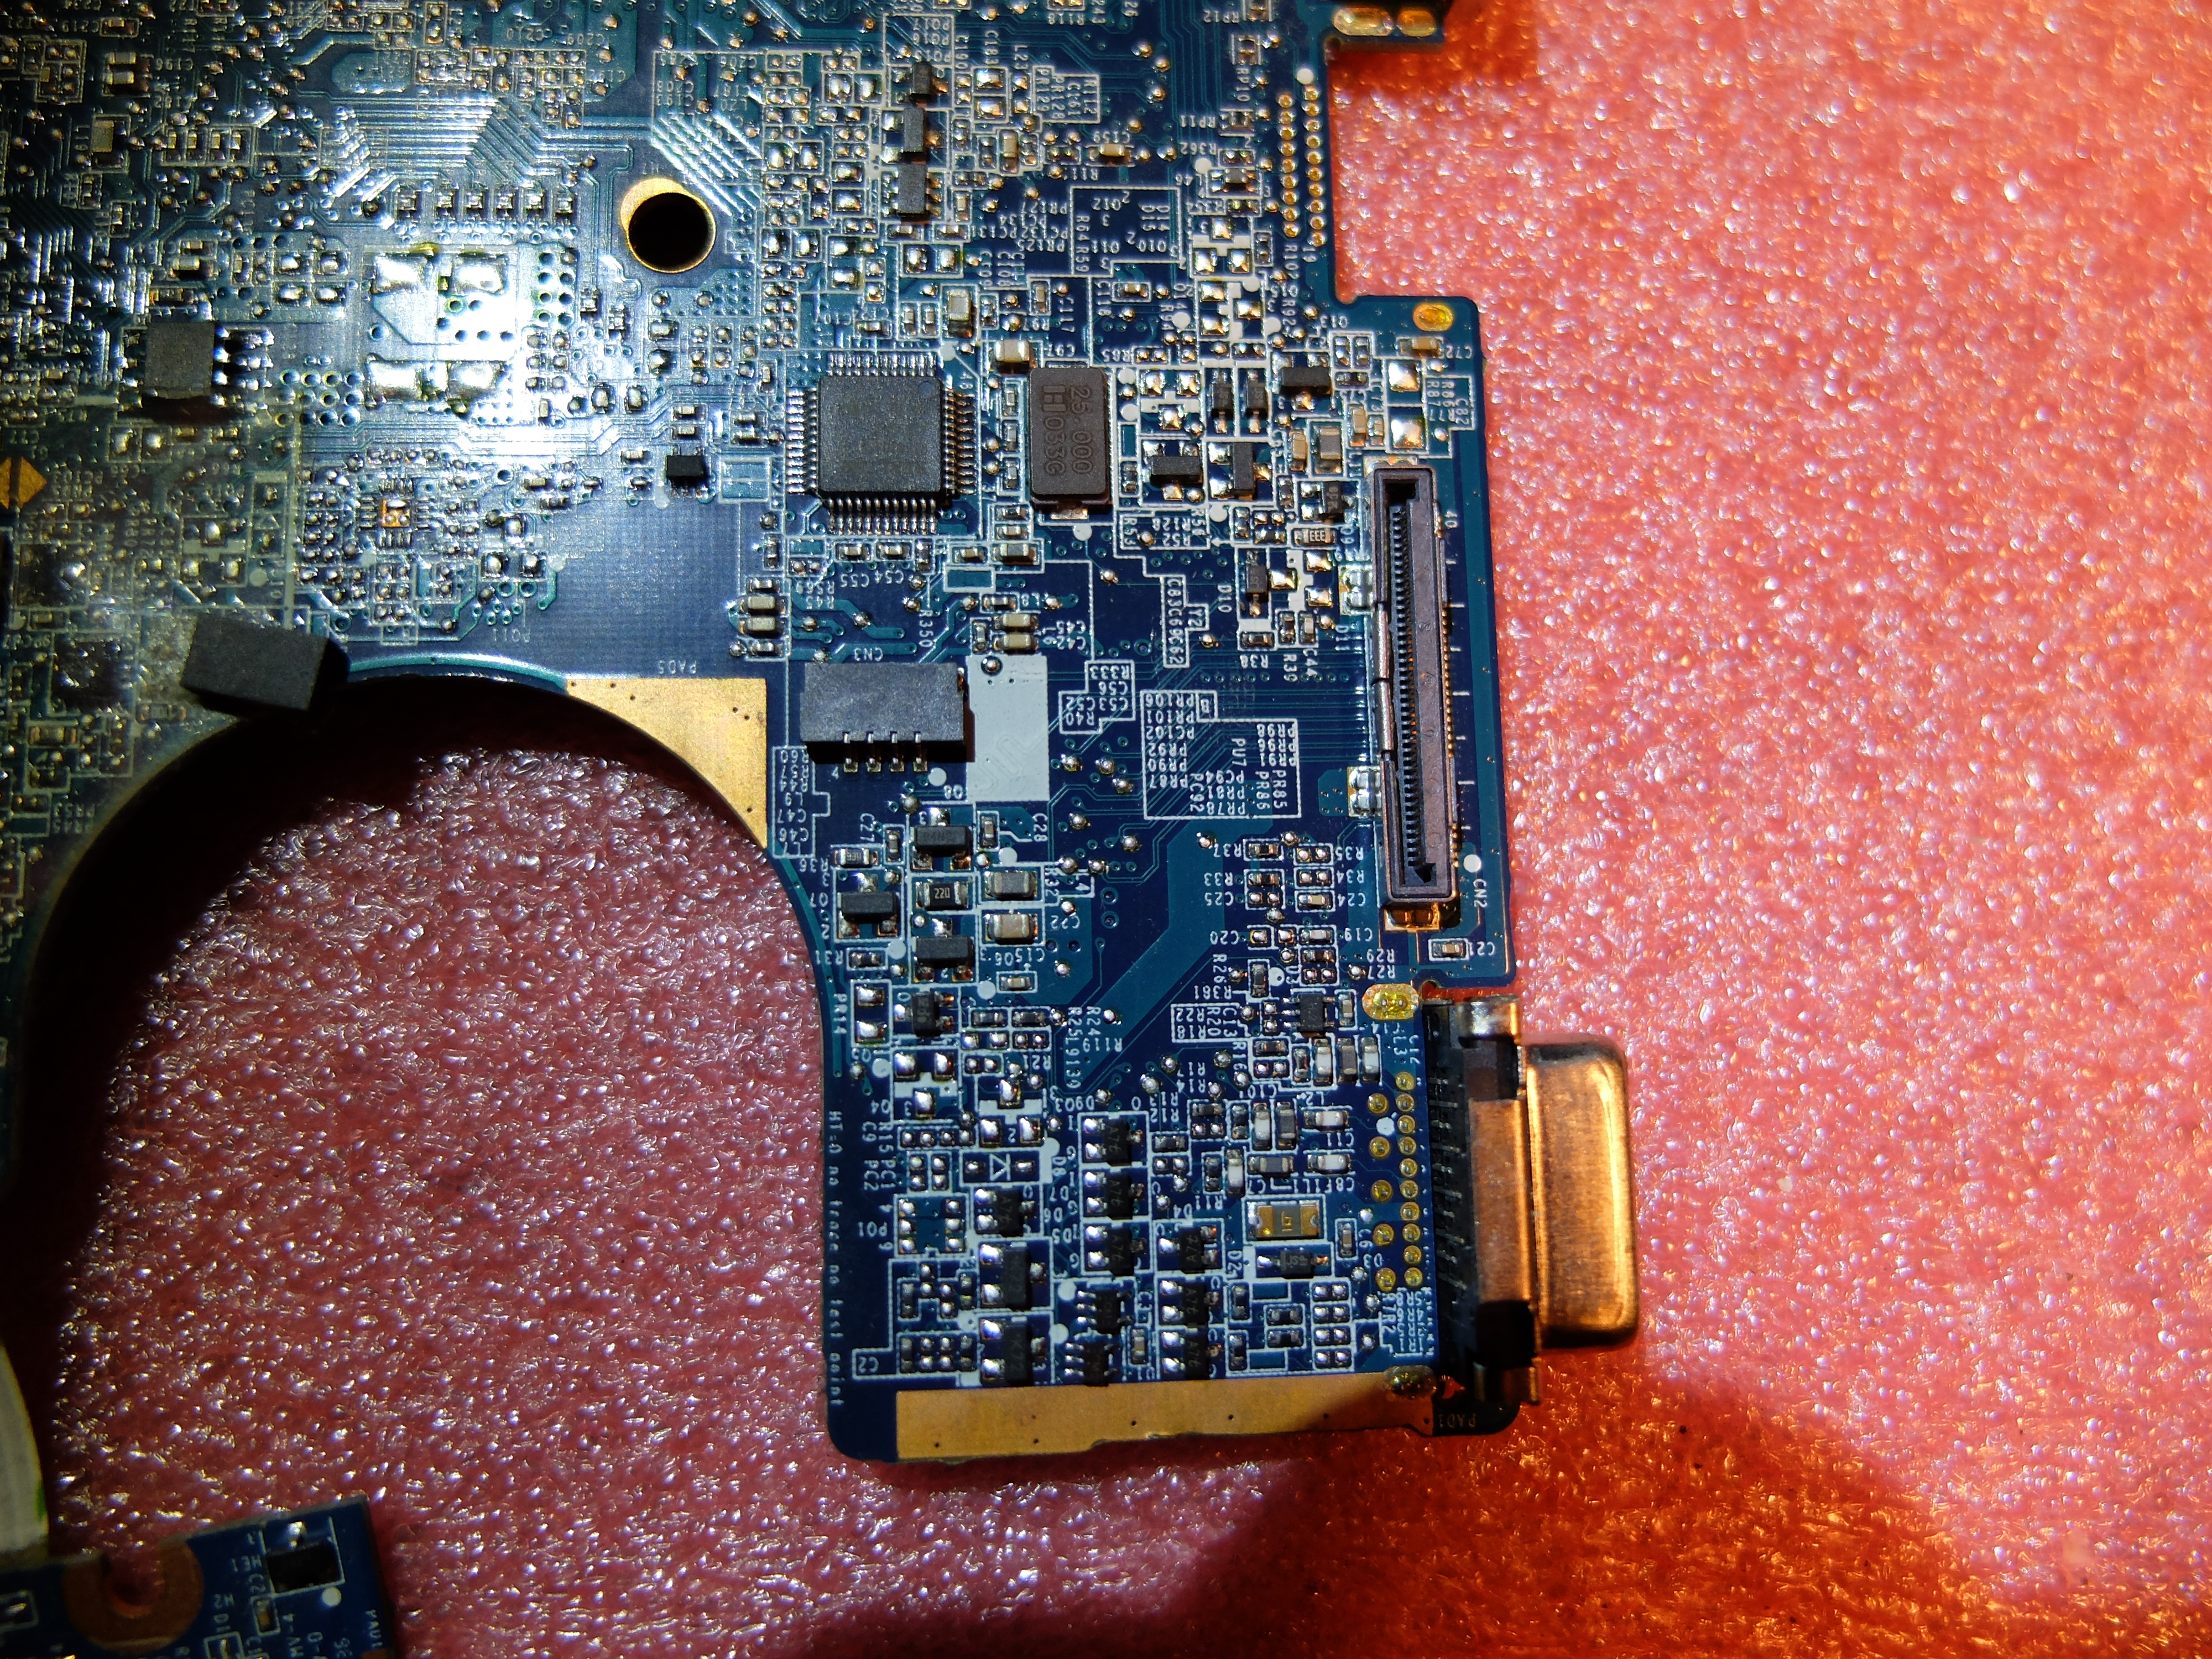 Compaq CQ56 - Bia�y ekran pojawia si� losowo, szukanie usterki.